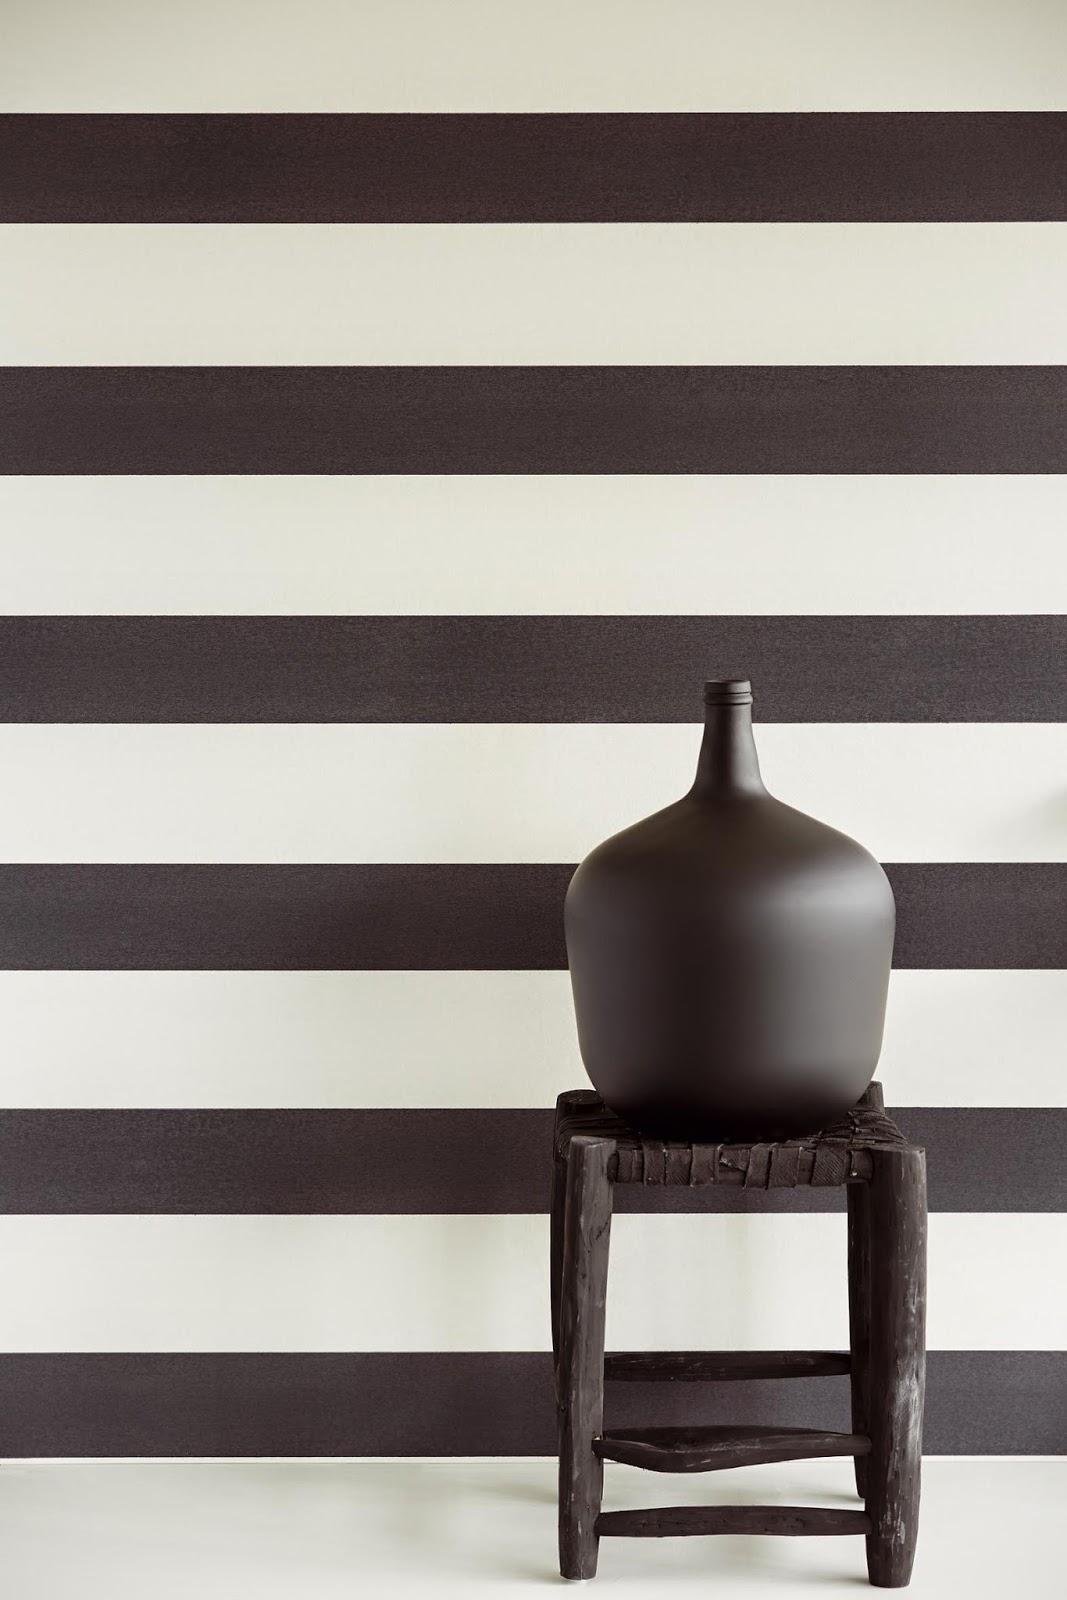 10 ideas para papel de pared decorativo - Papel autoadhesivo para paredes ...